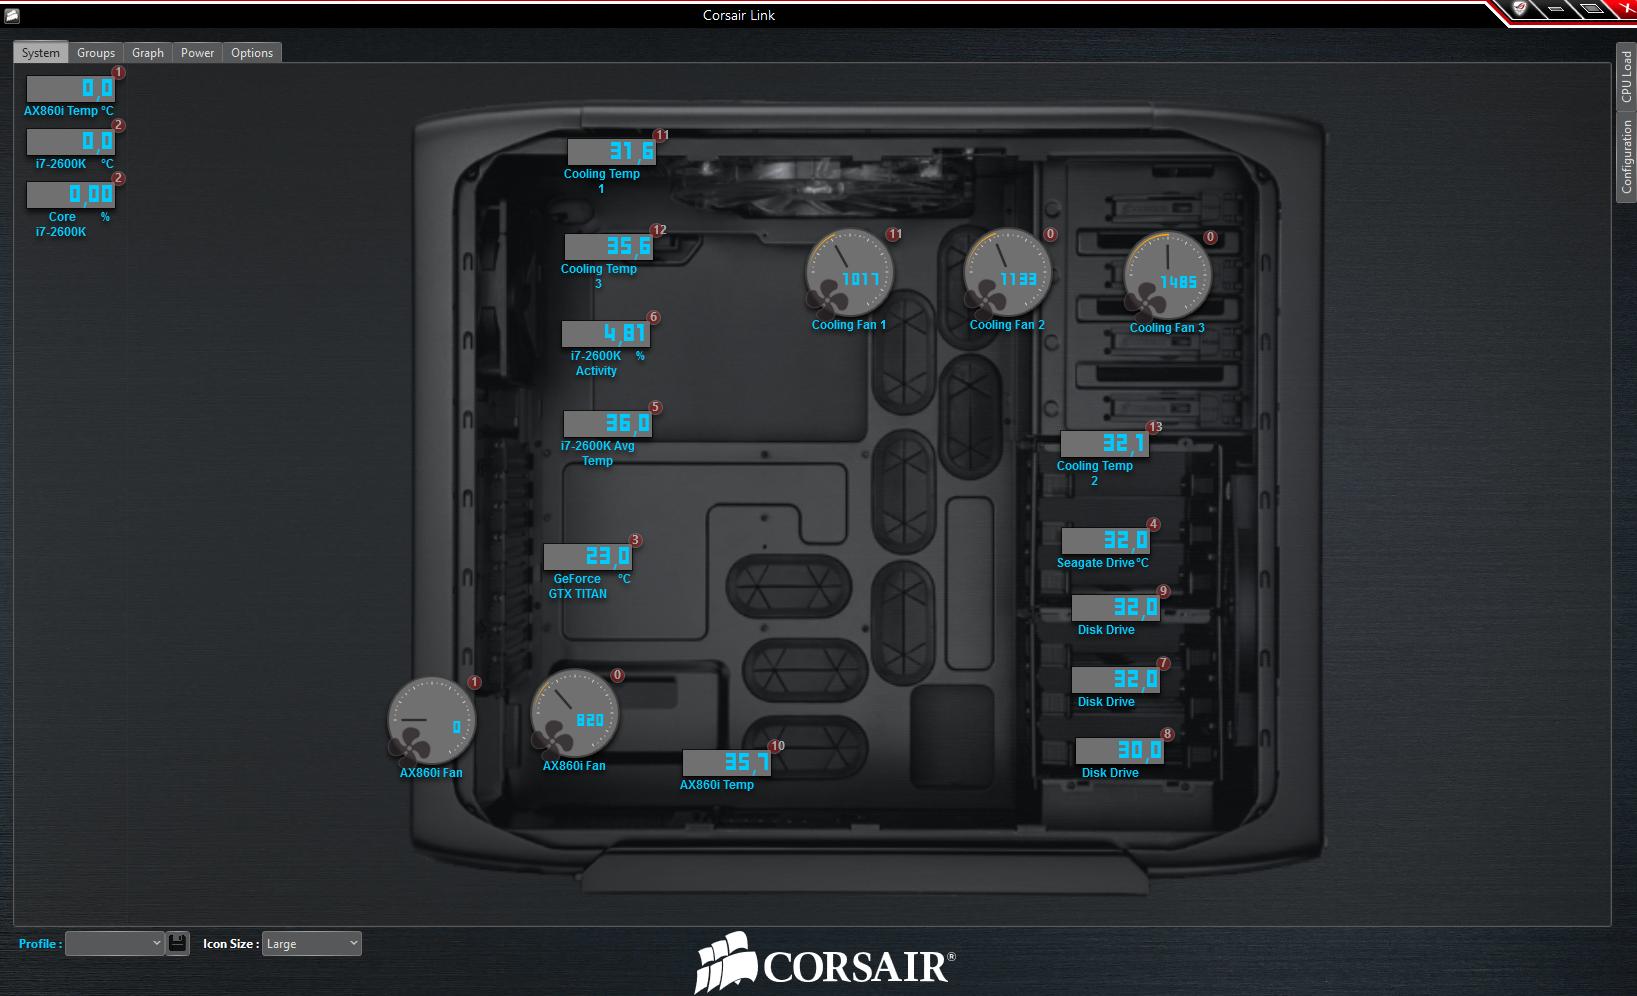 Corsair logiciel boitier